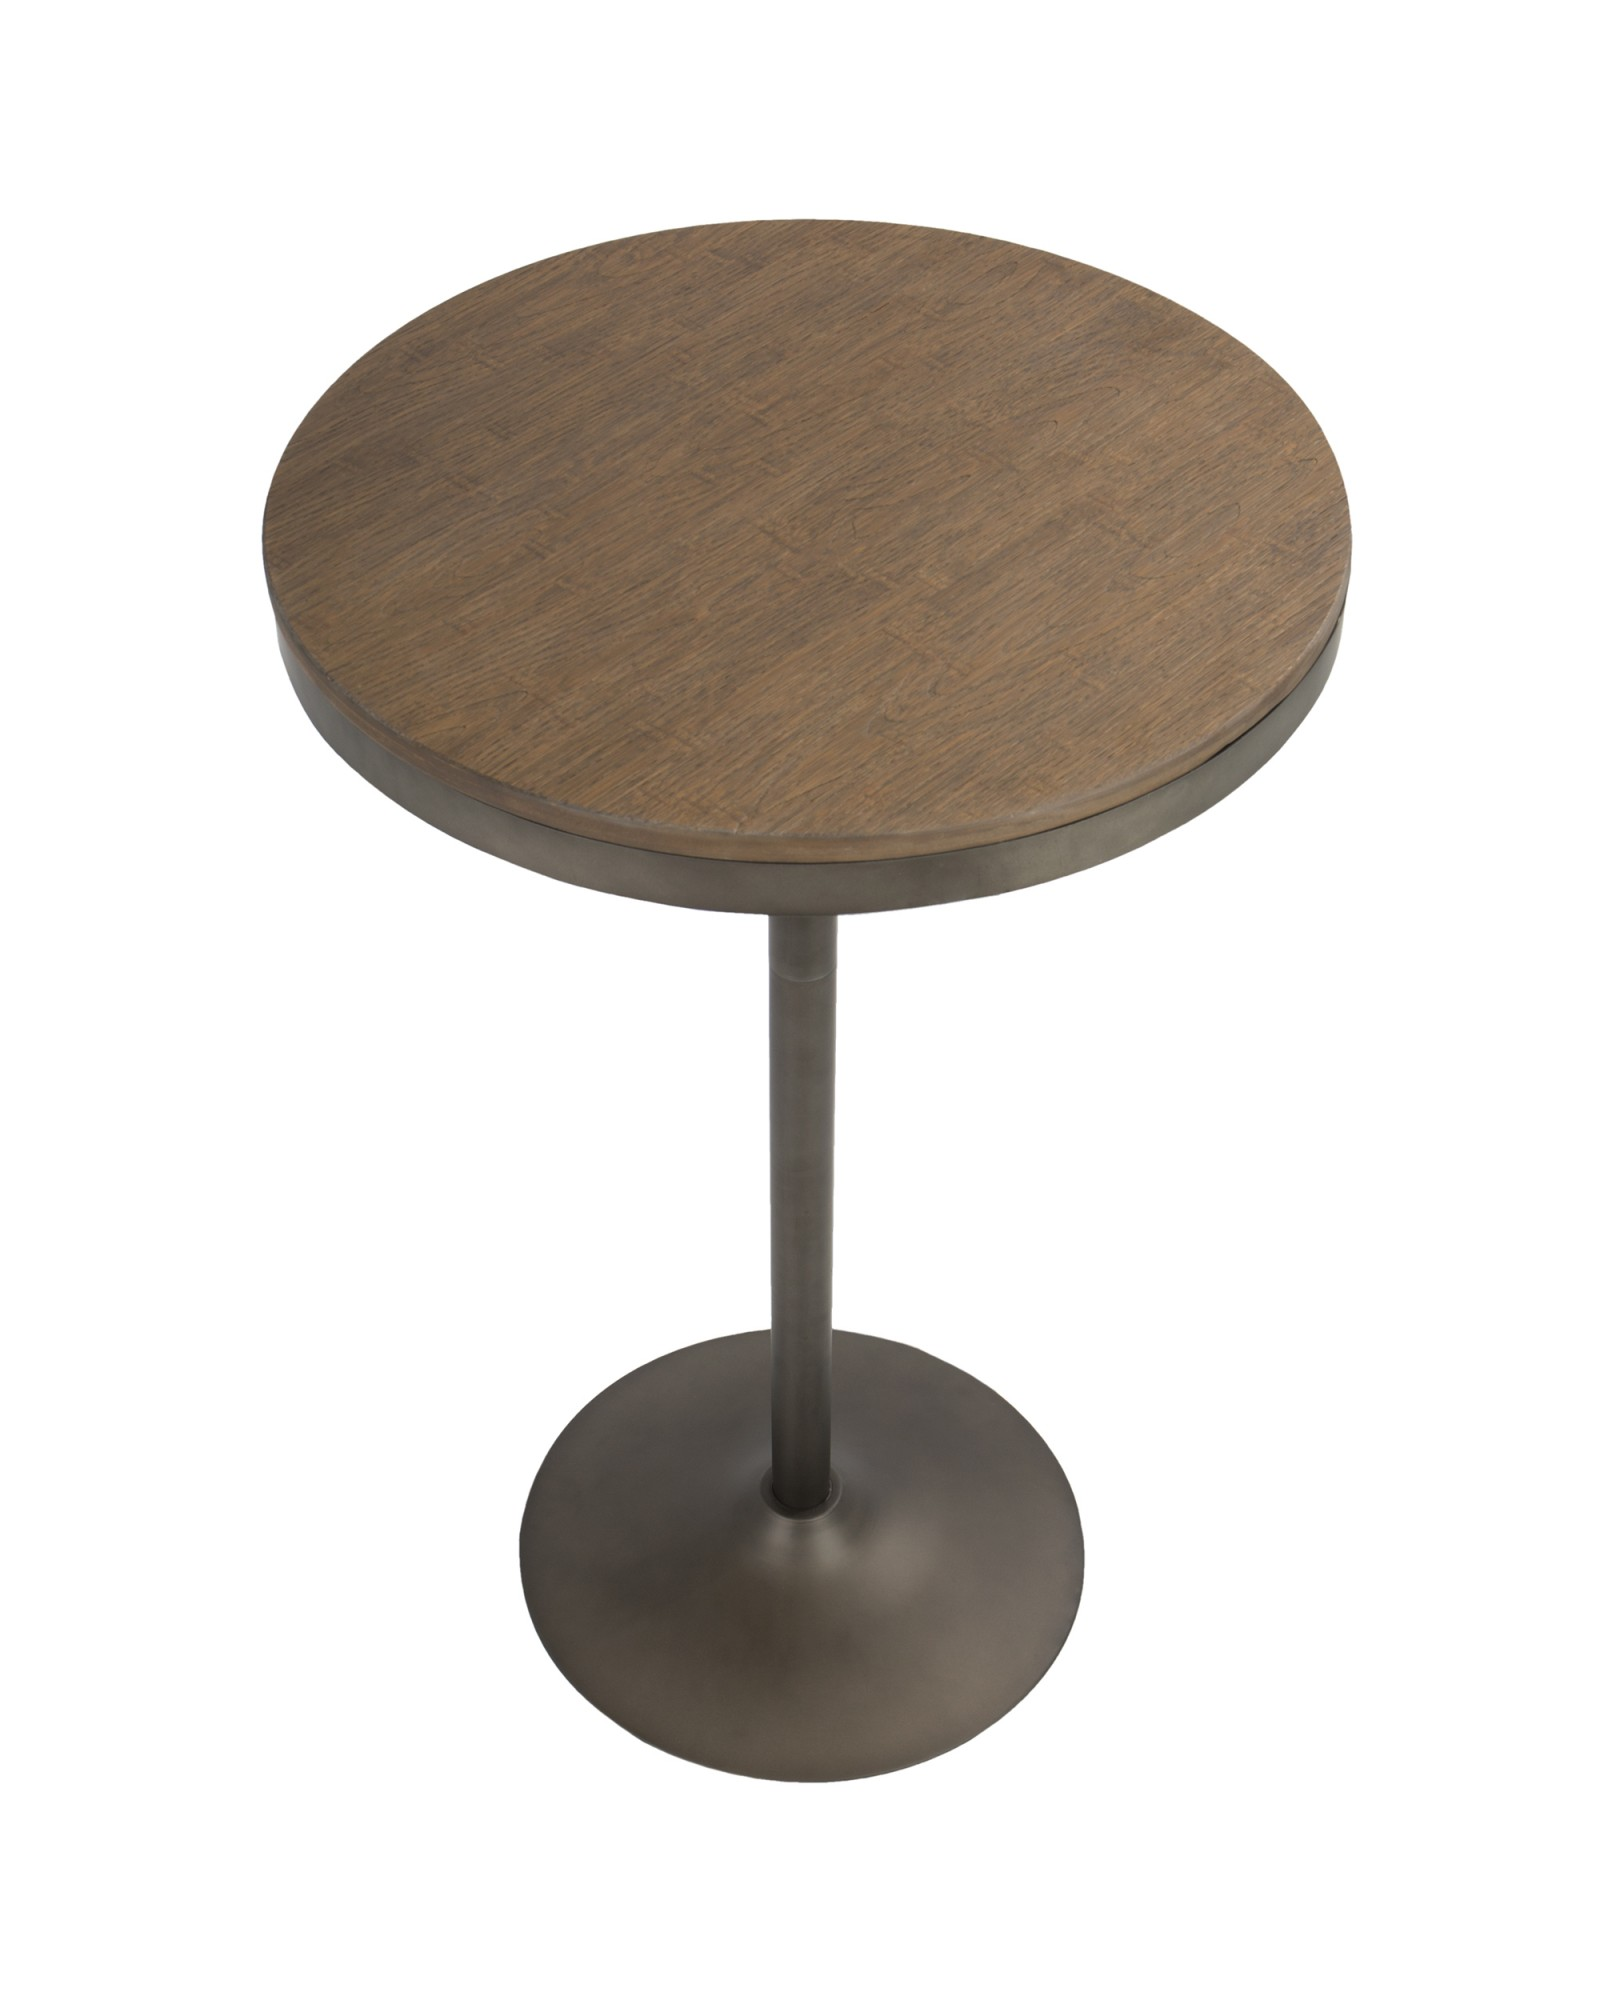 Dakota Industrial Adjustable Bar / Dinette Table in Antique and Brown